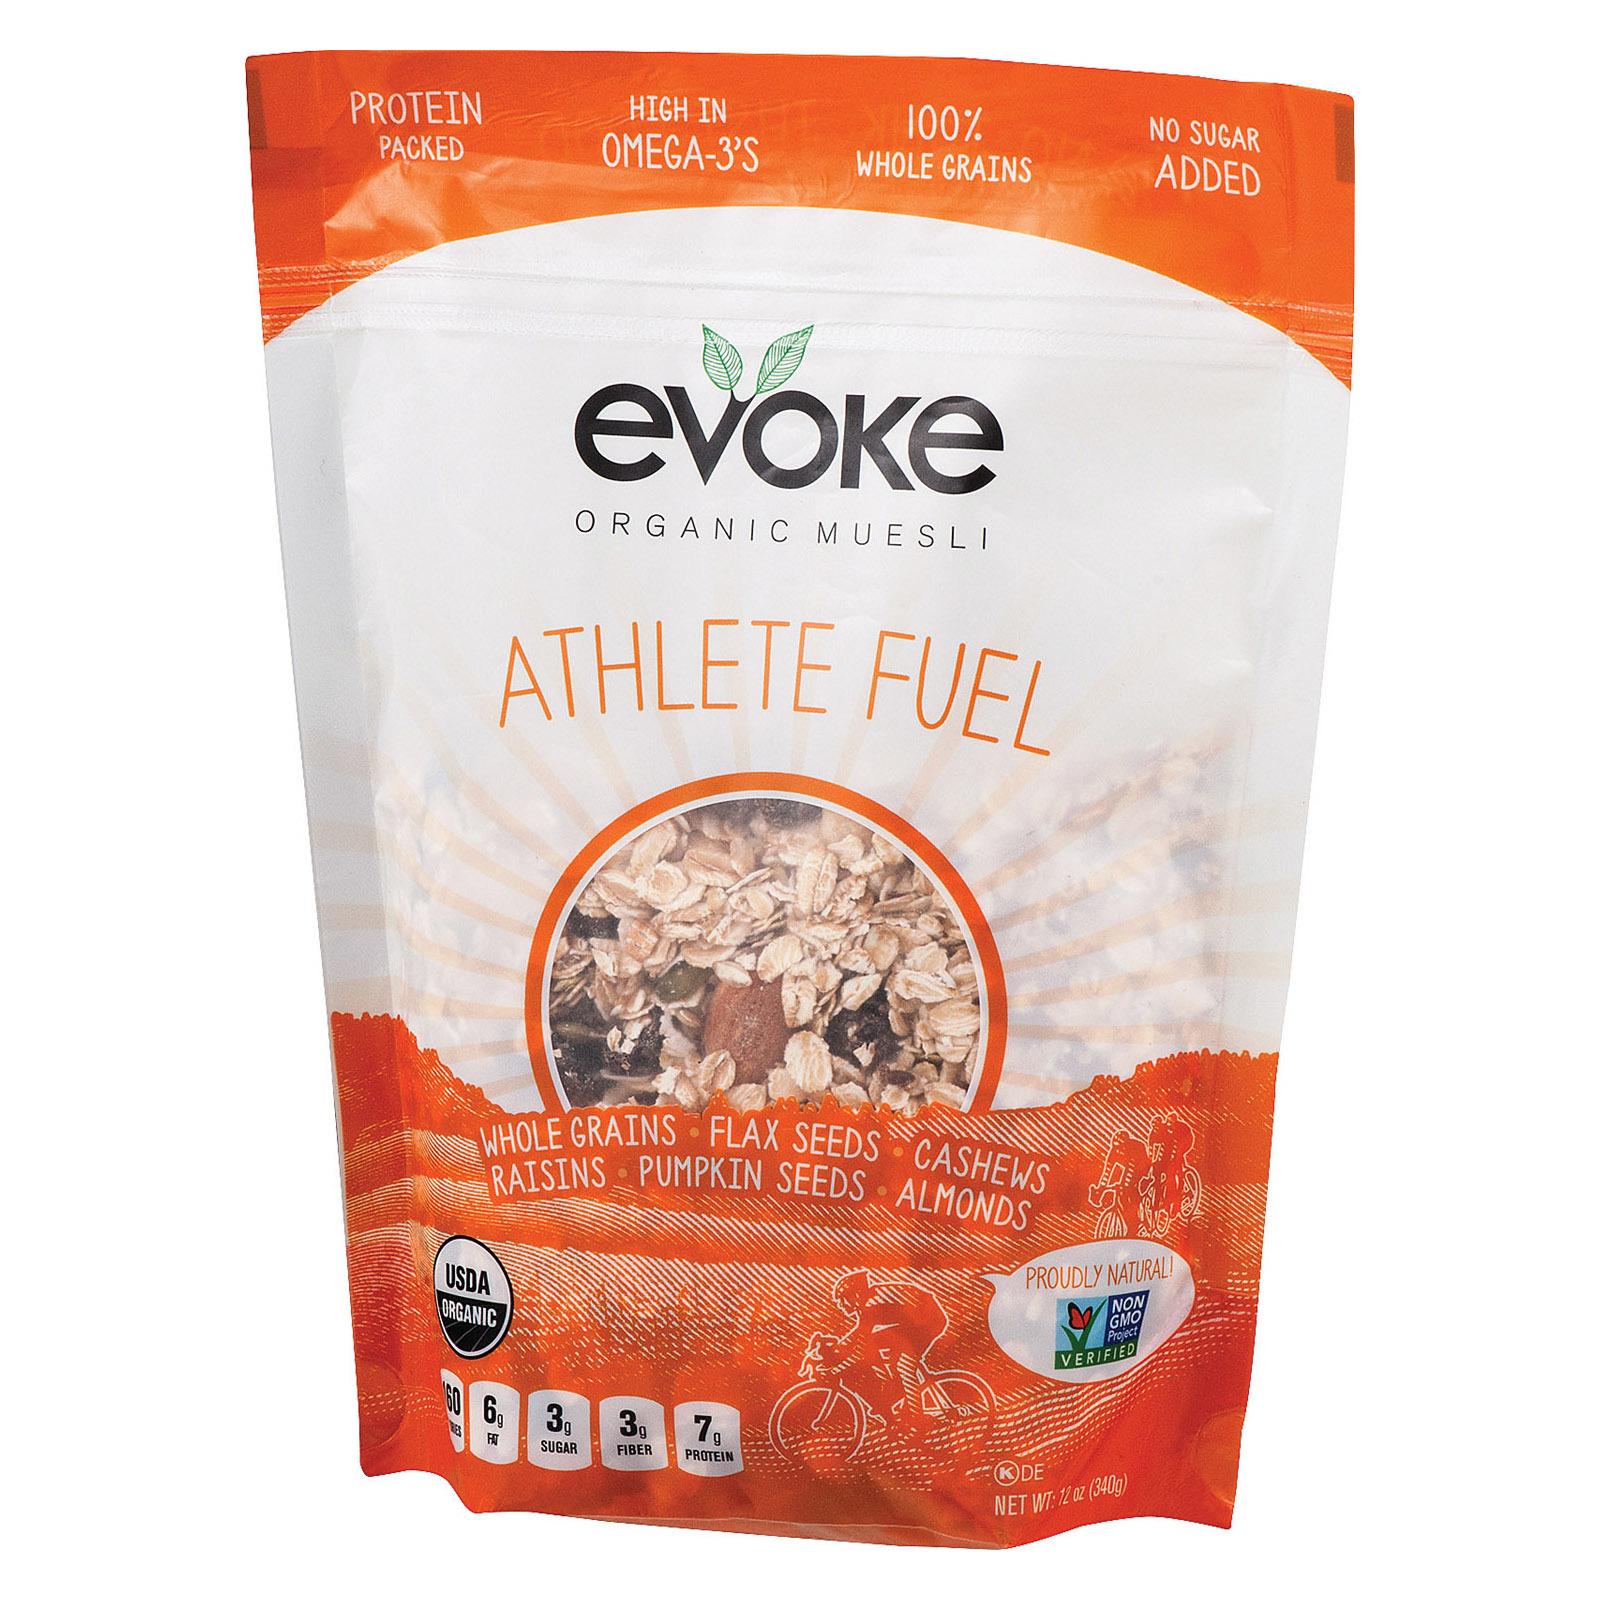 Evoke Healthy Foods Athlete Fuel Organic Muesli - Organic Muesli - Case of 6 - 12 oz.